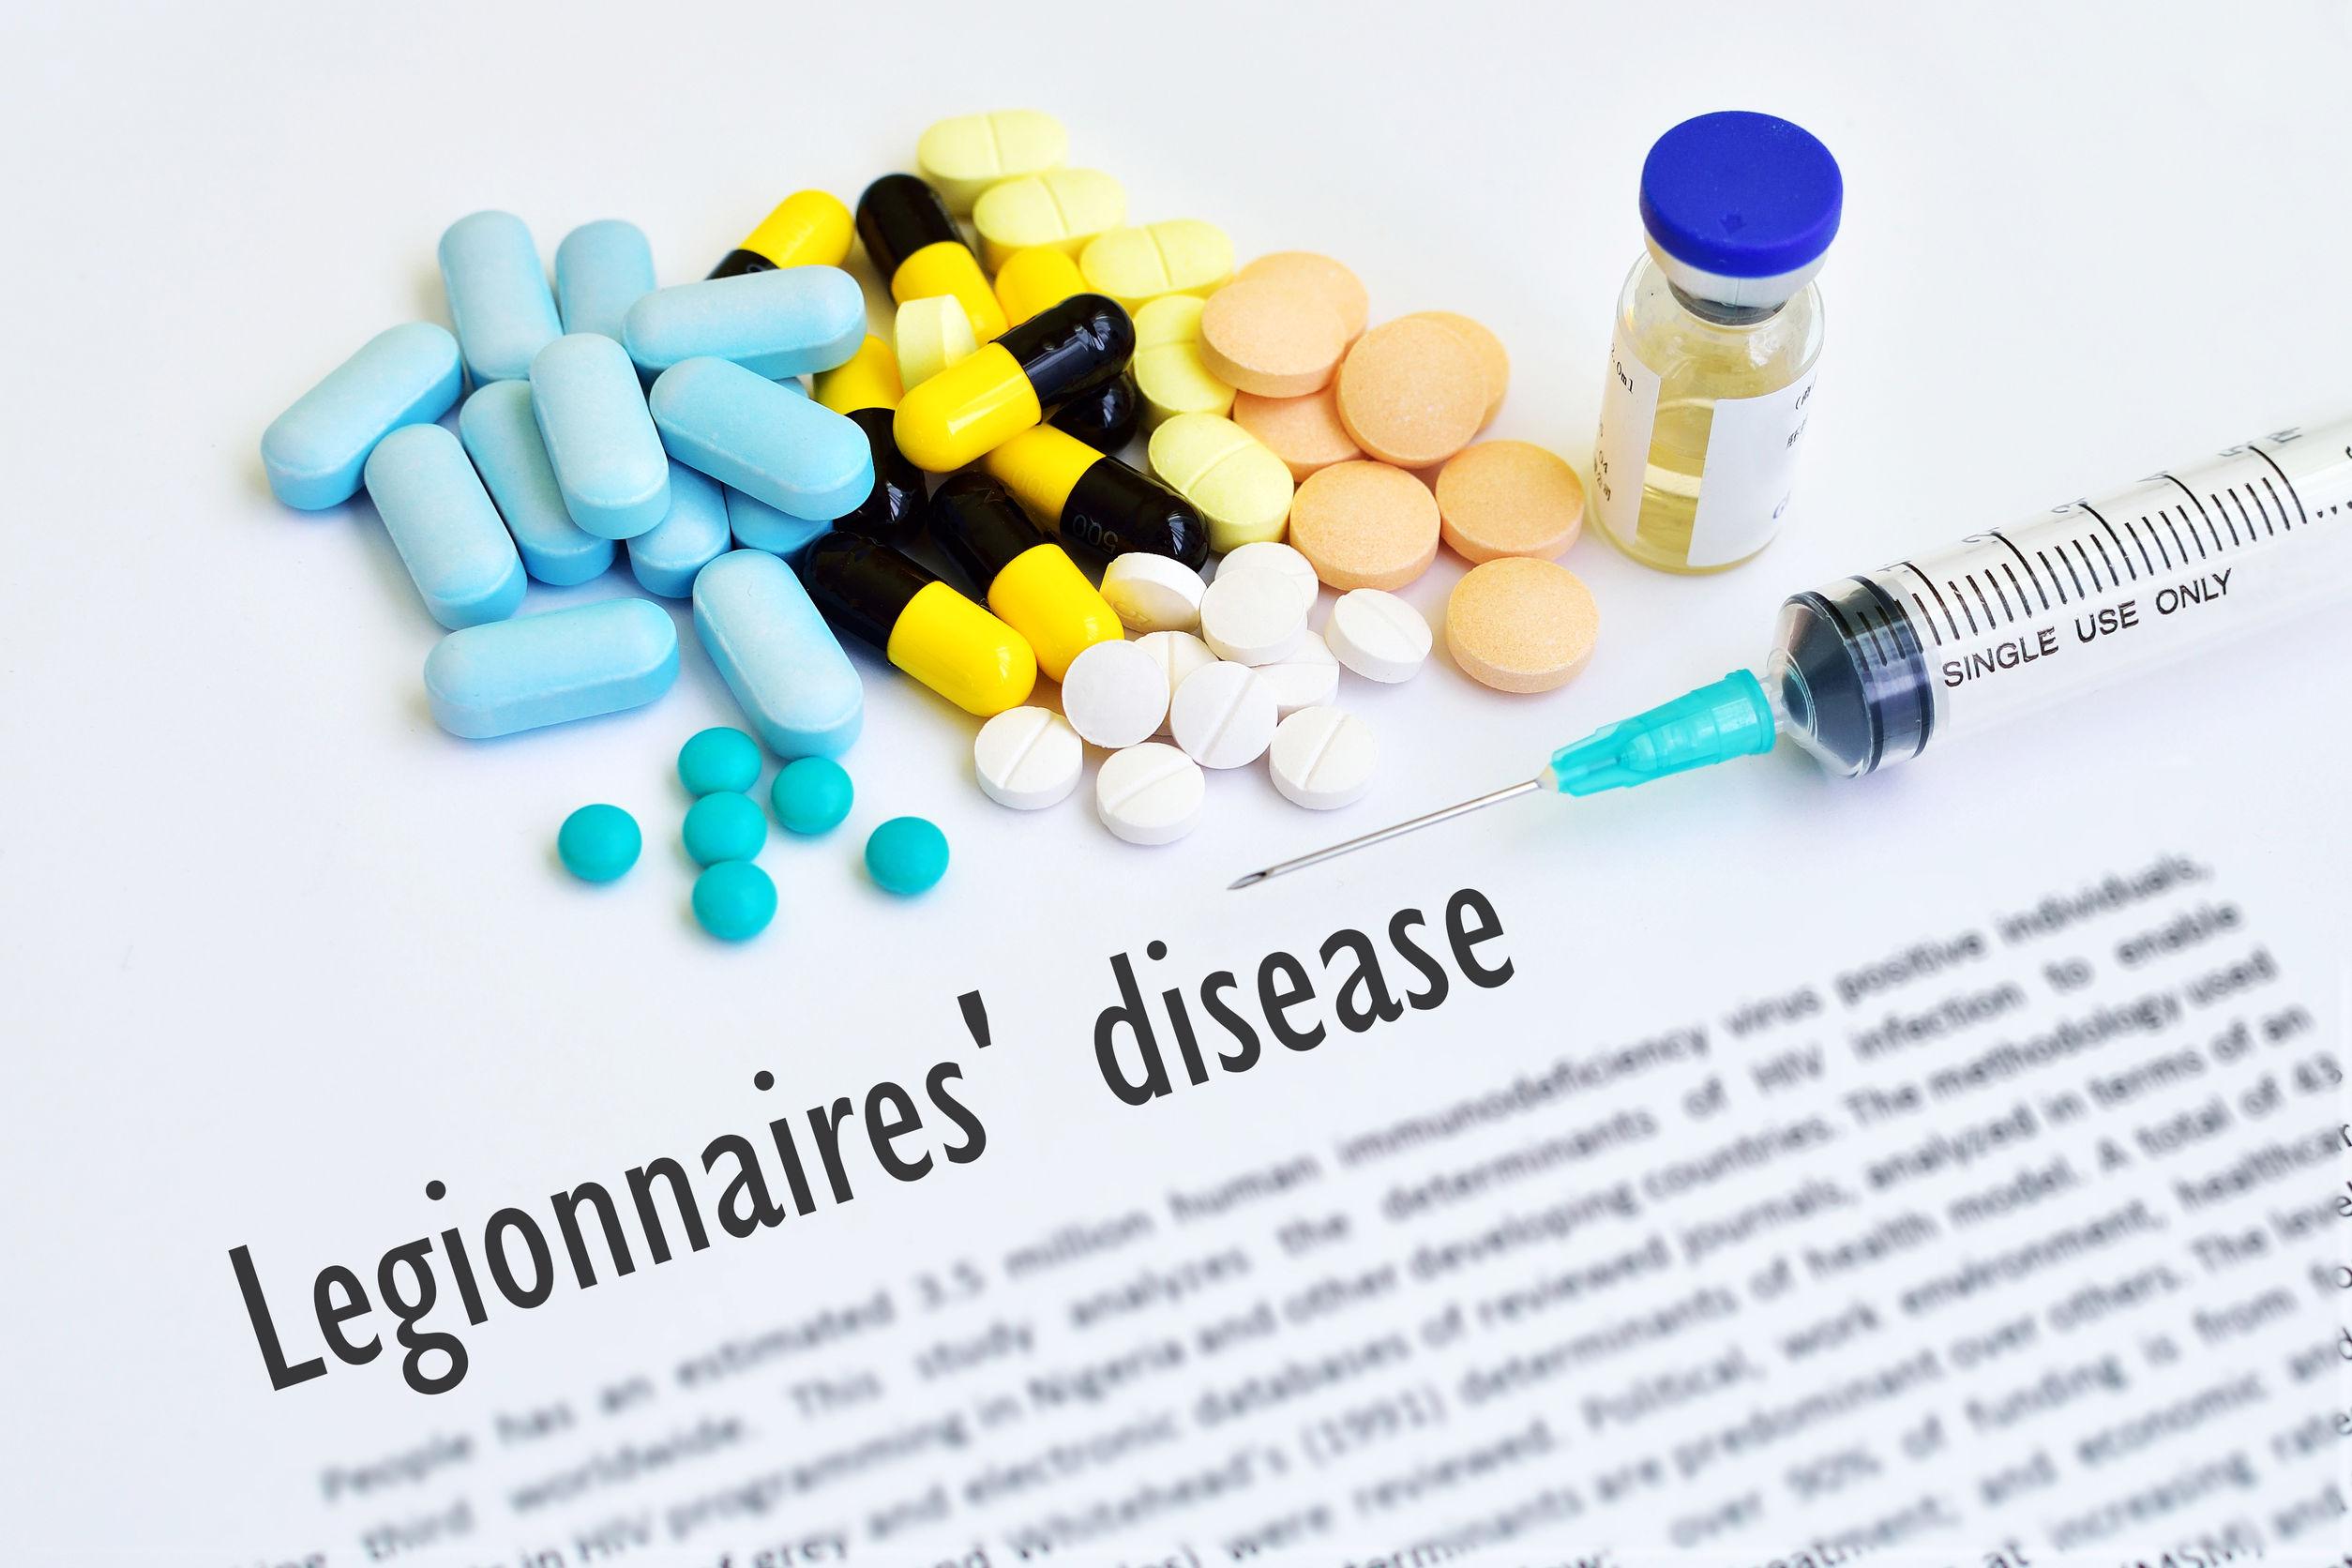 Legionnaires - e-Learning CPD